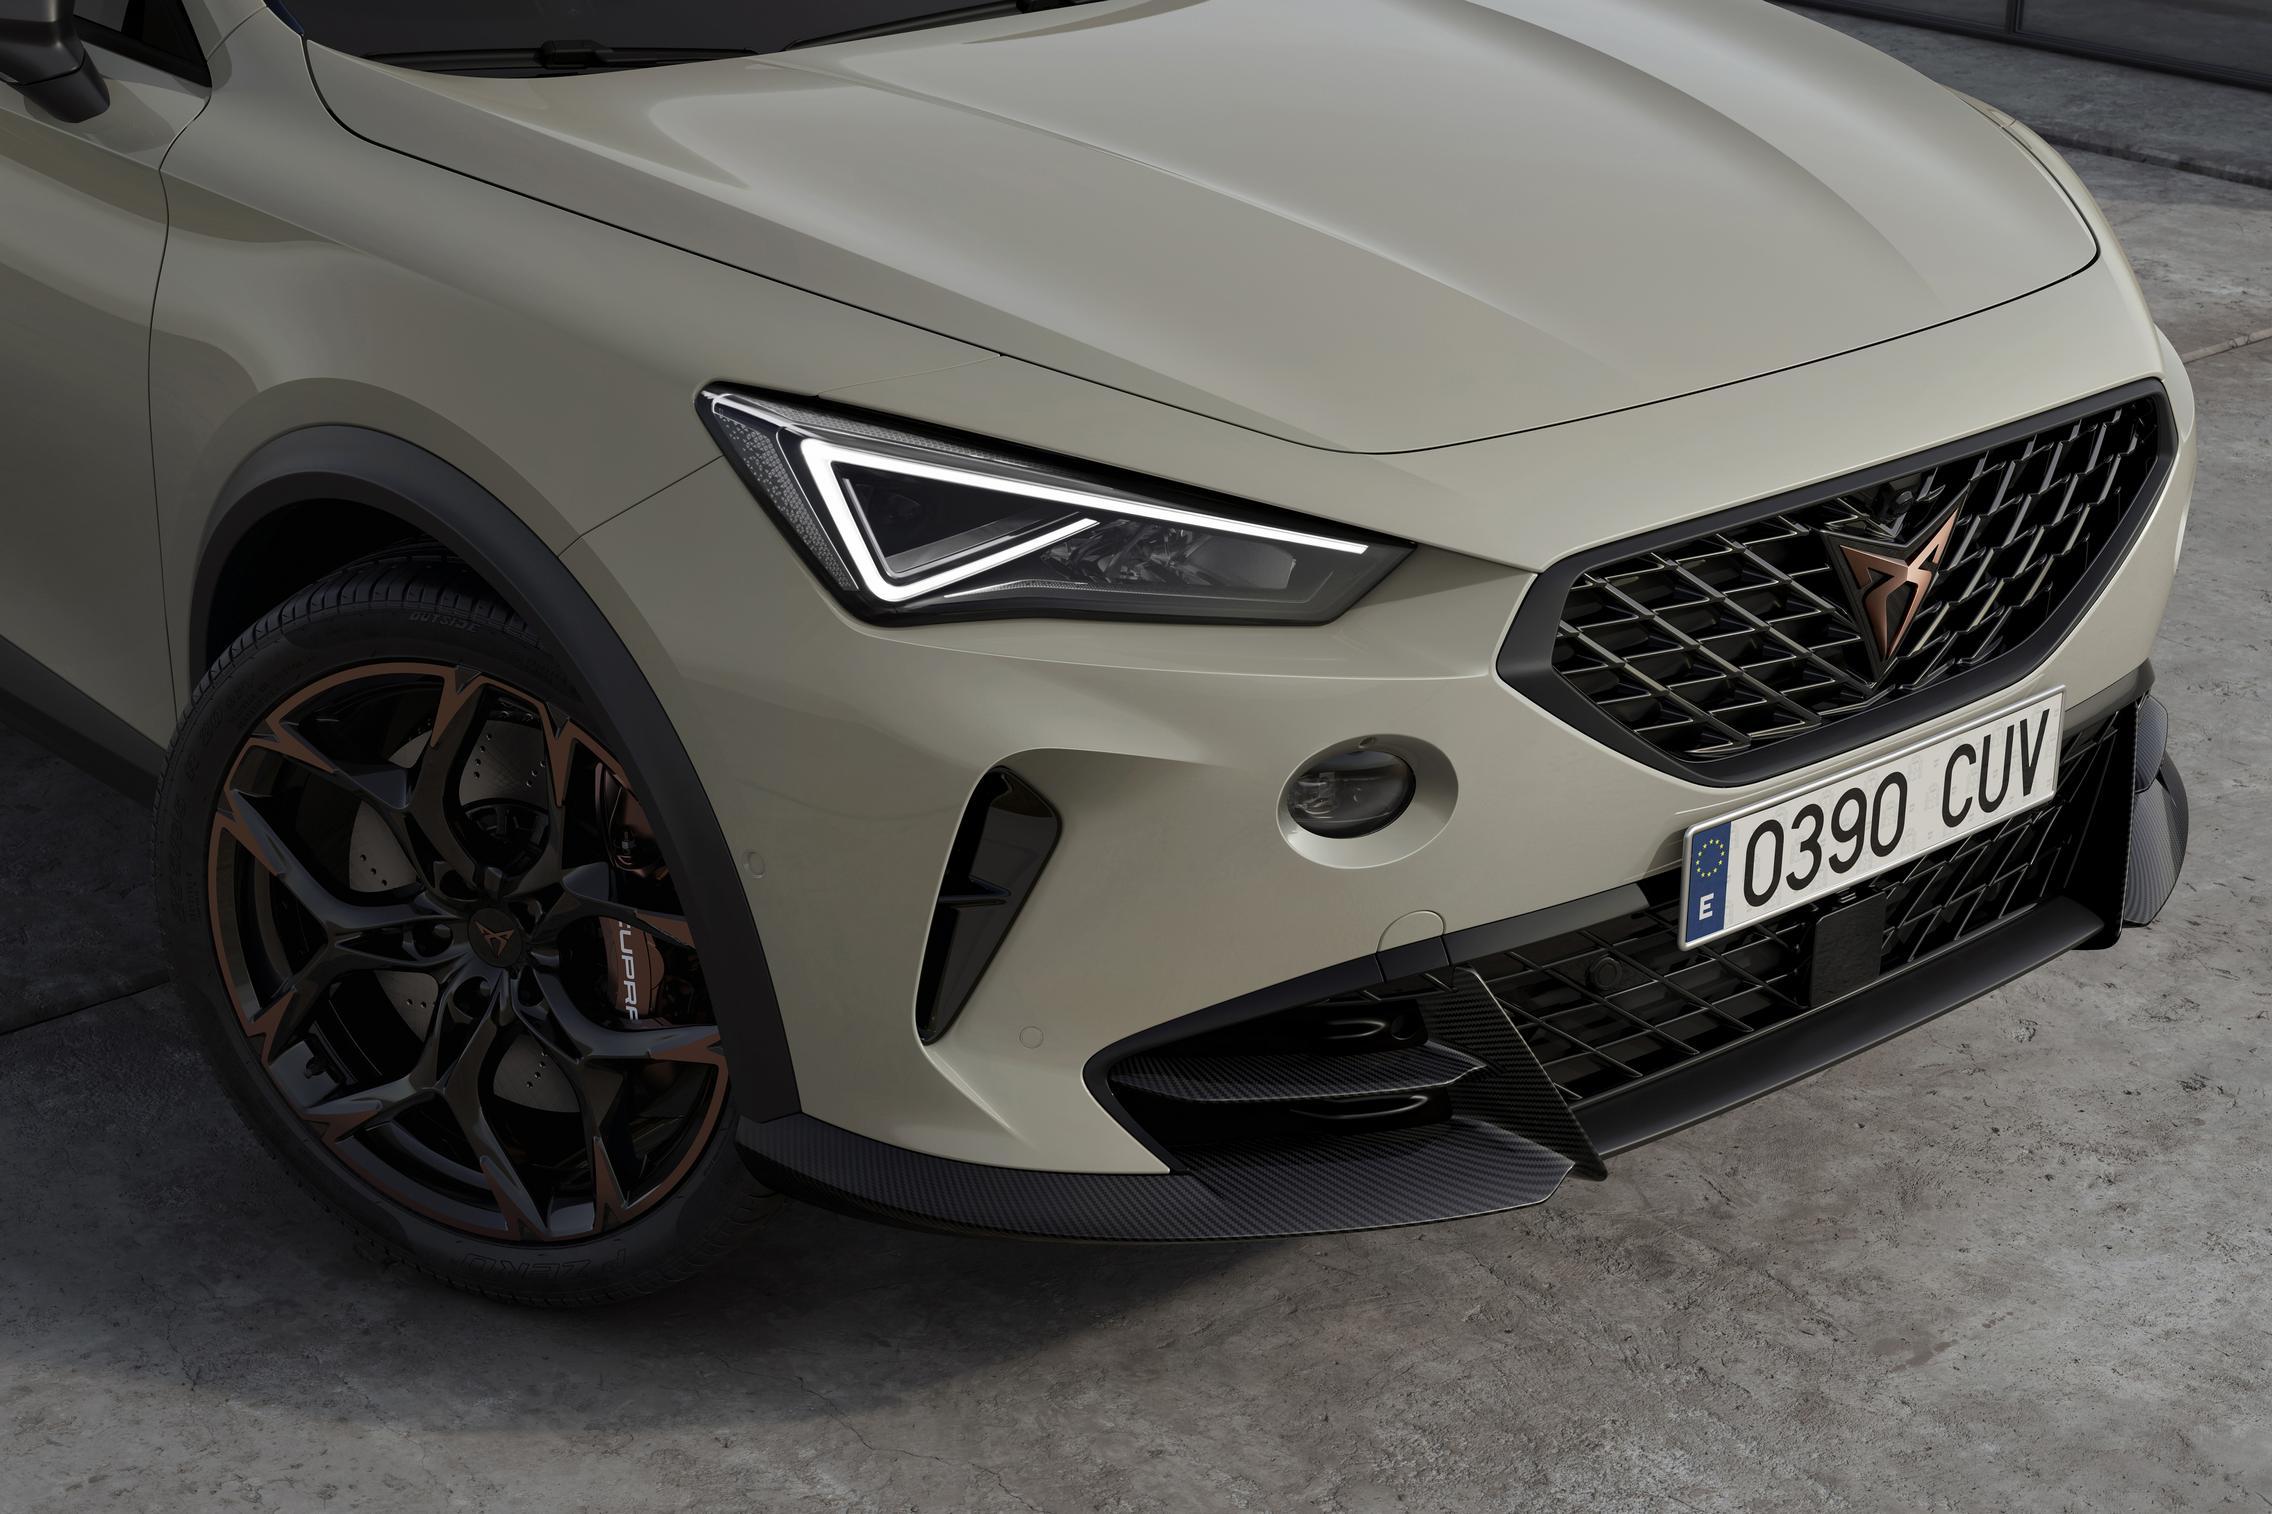 Cupra Formentor VZ5 headlights